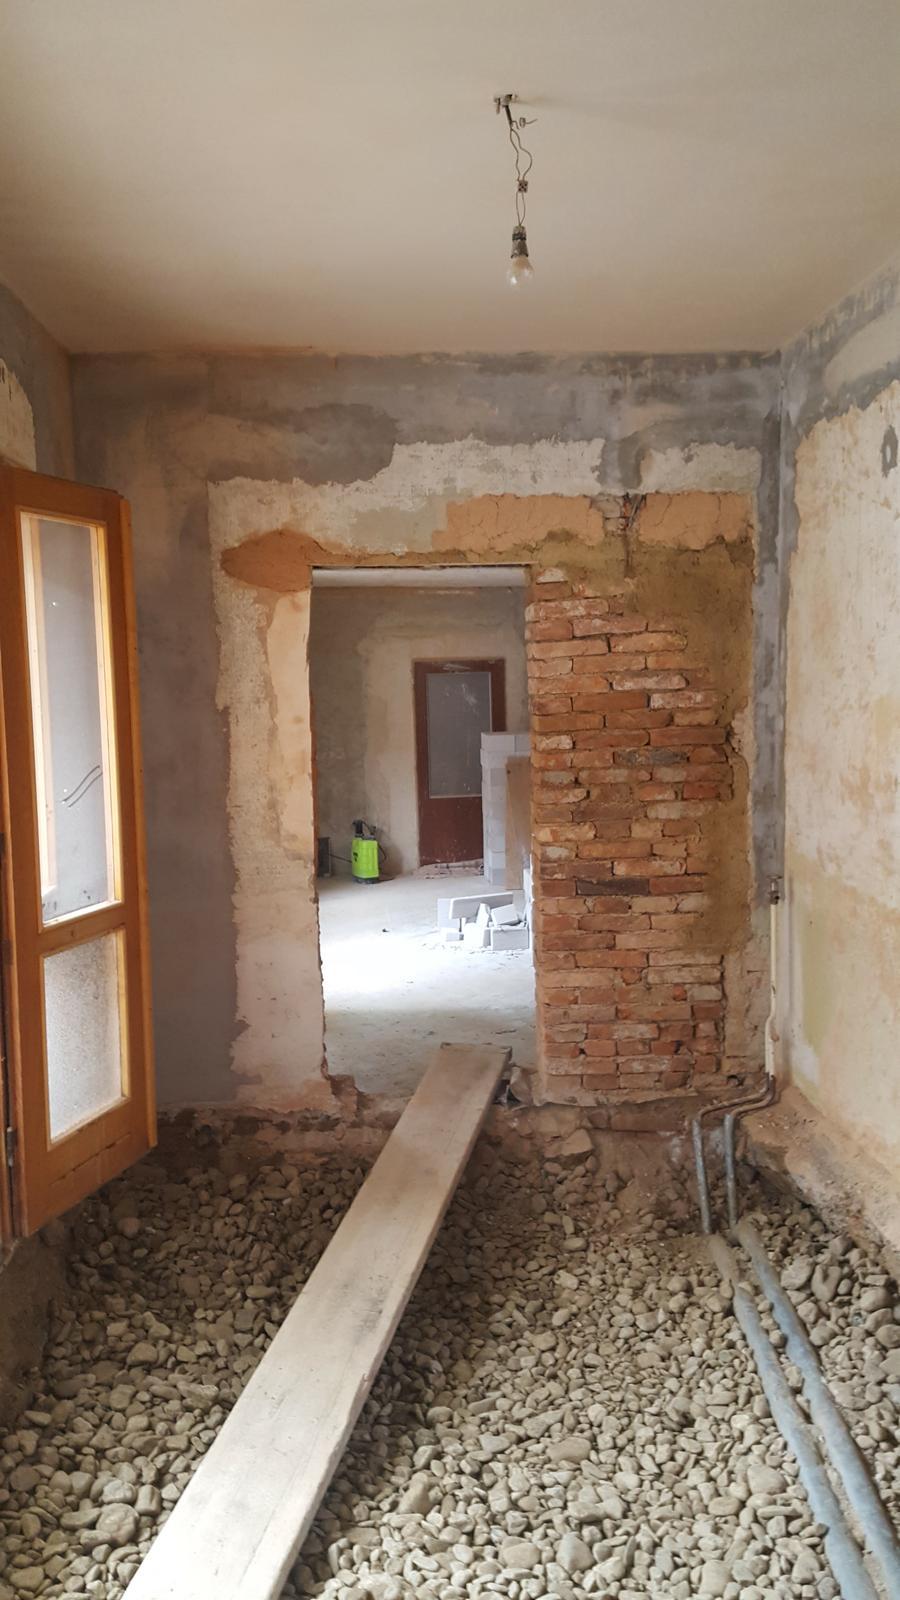 Prerabka domu v historickom centre - priestor na nove dvere pripraveny,vyuzivaju sa stare pouzitelne tehly